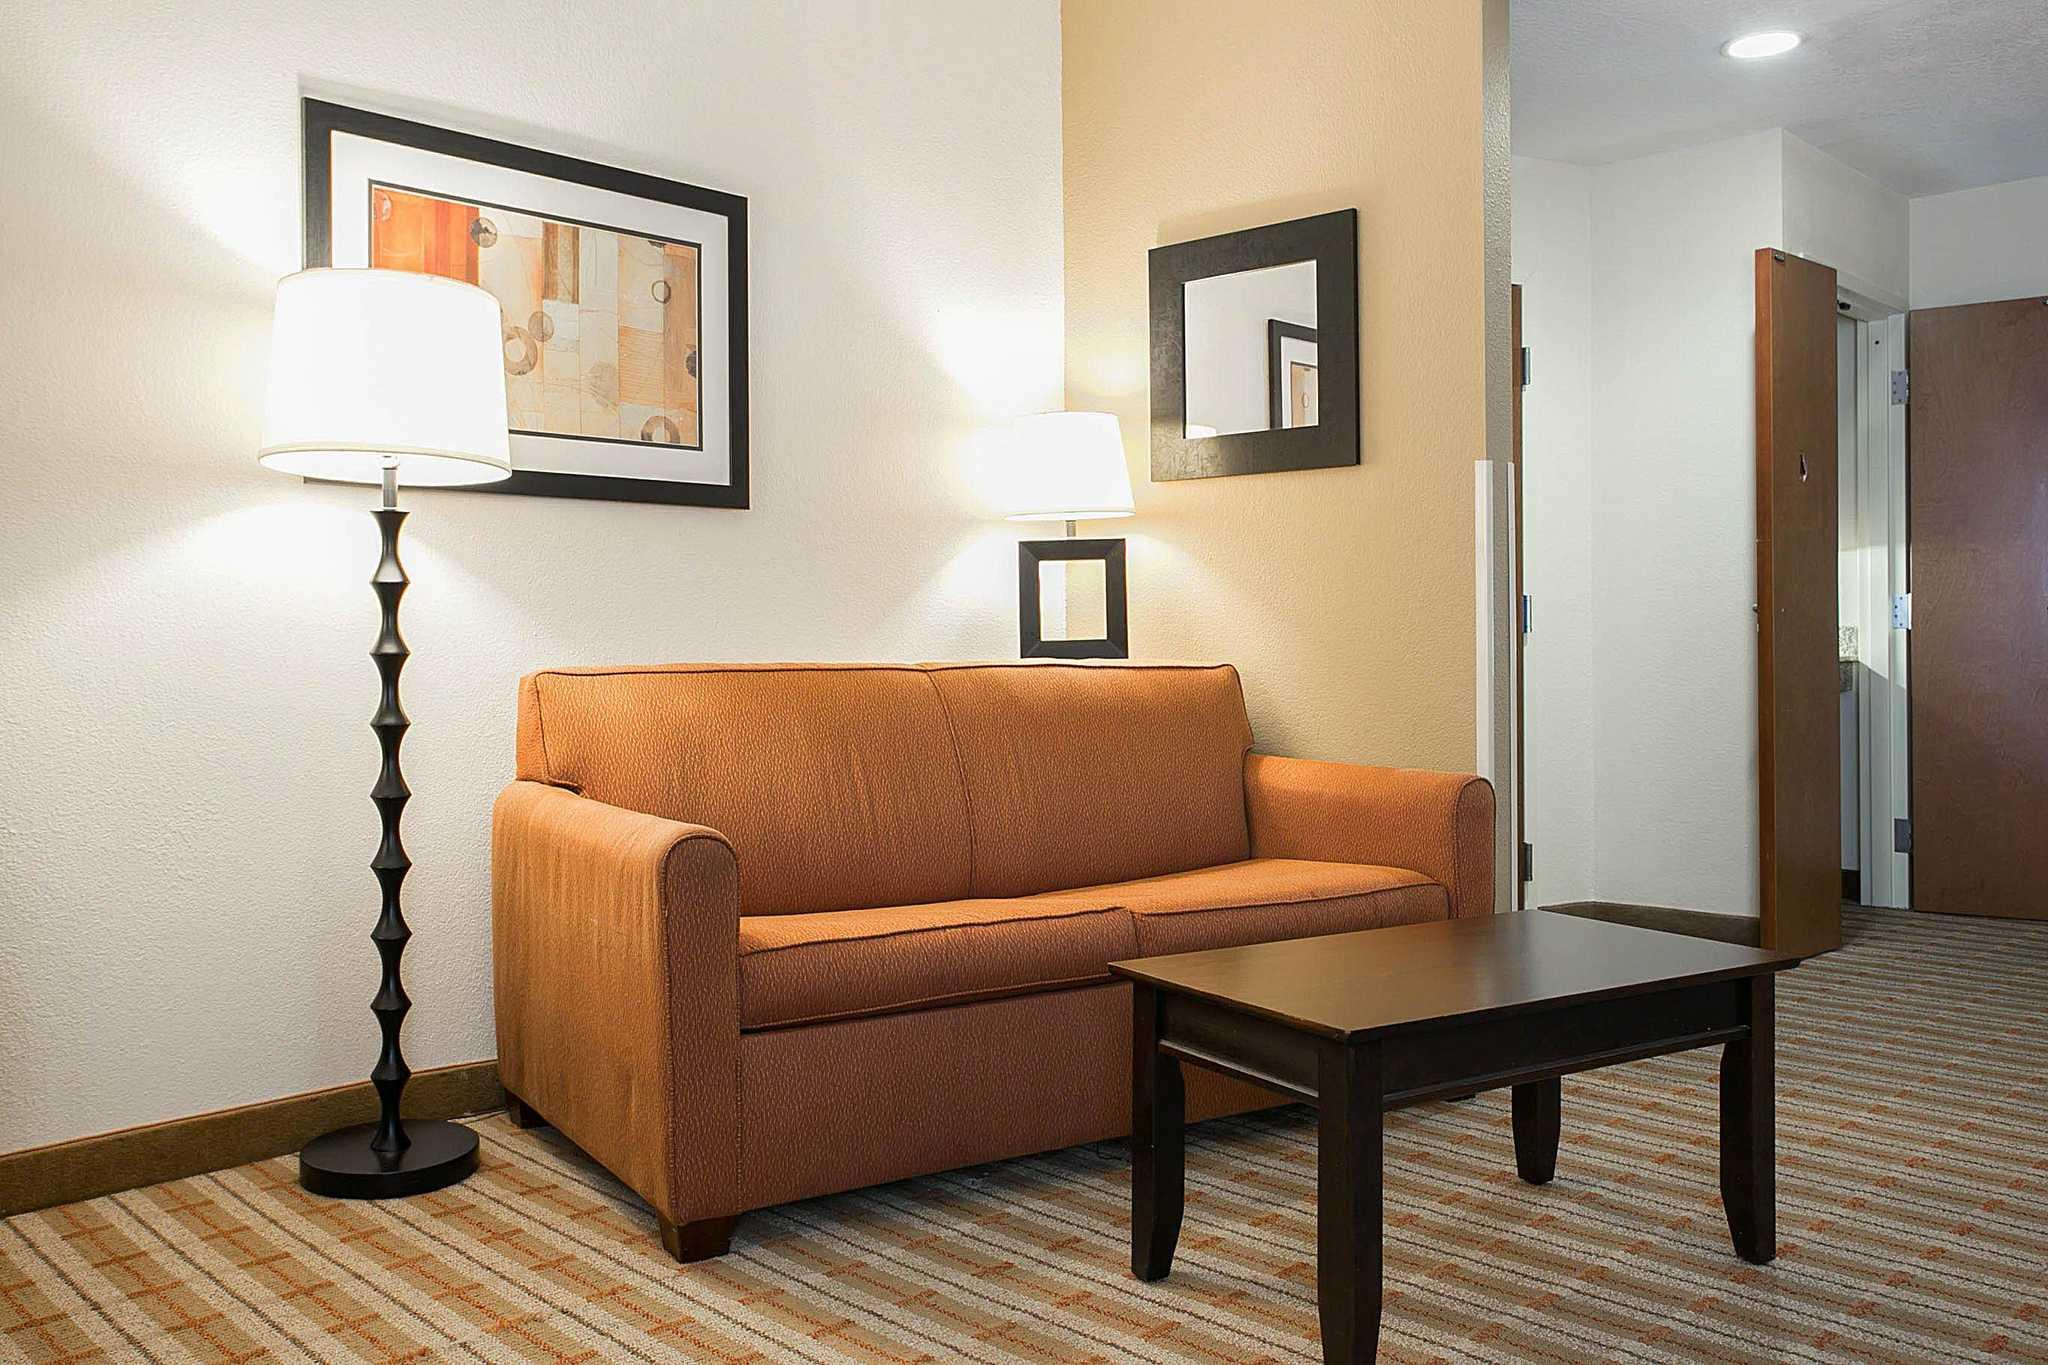 Comfort Suites image 34